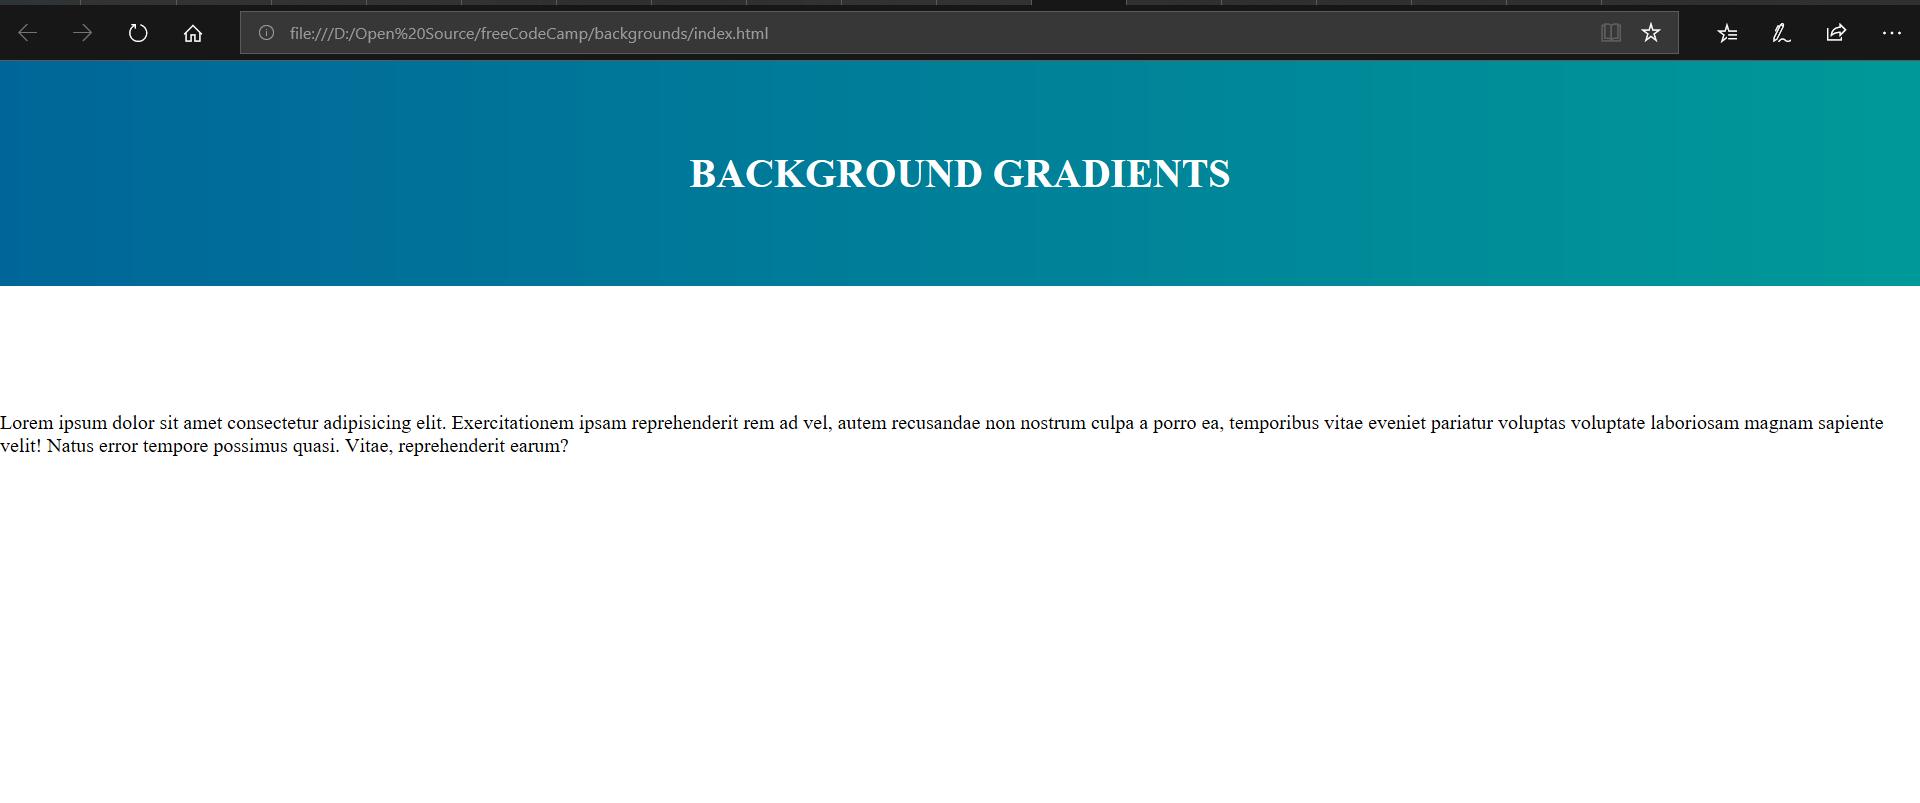 background gradient example image